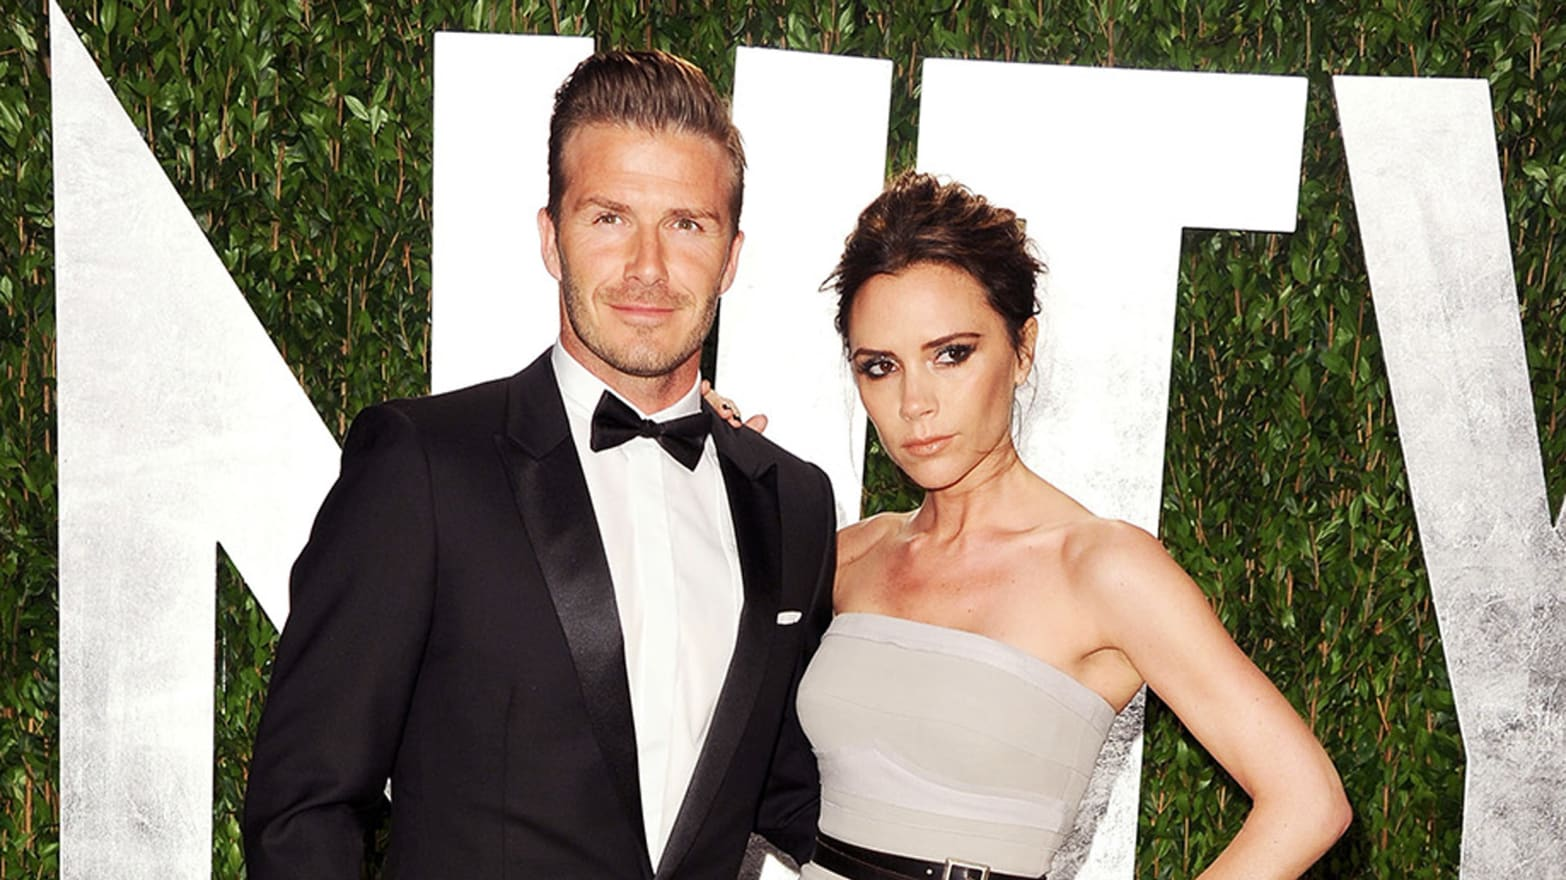 fadb3d15c4b Victoria and David Beckham Celebrate Their 15th Wedding Anniversary